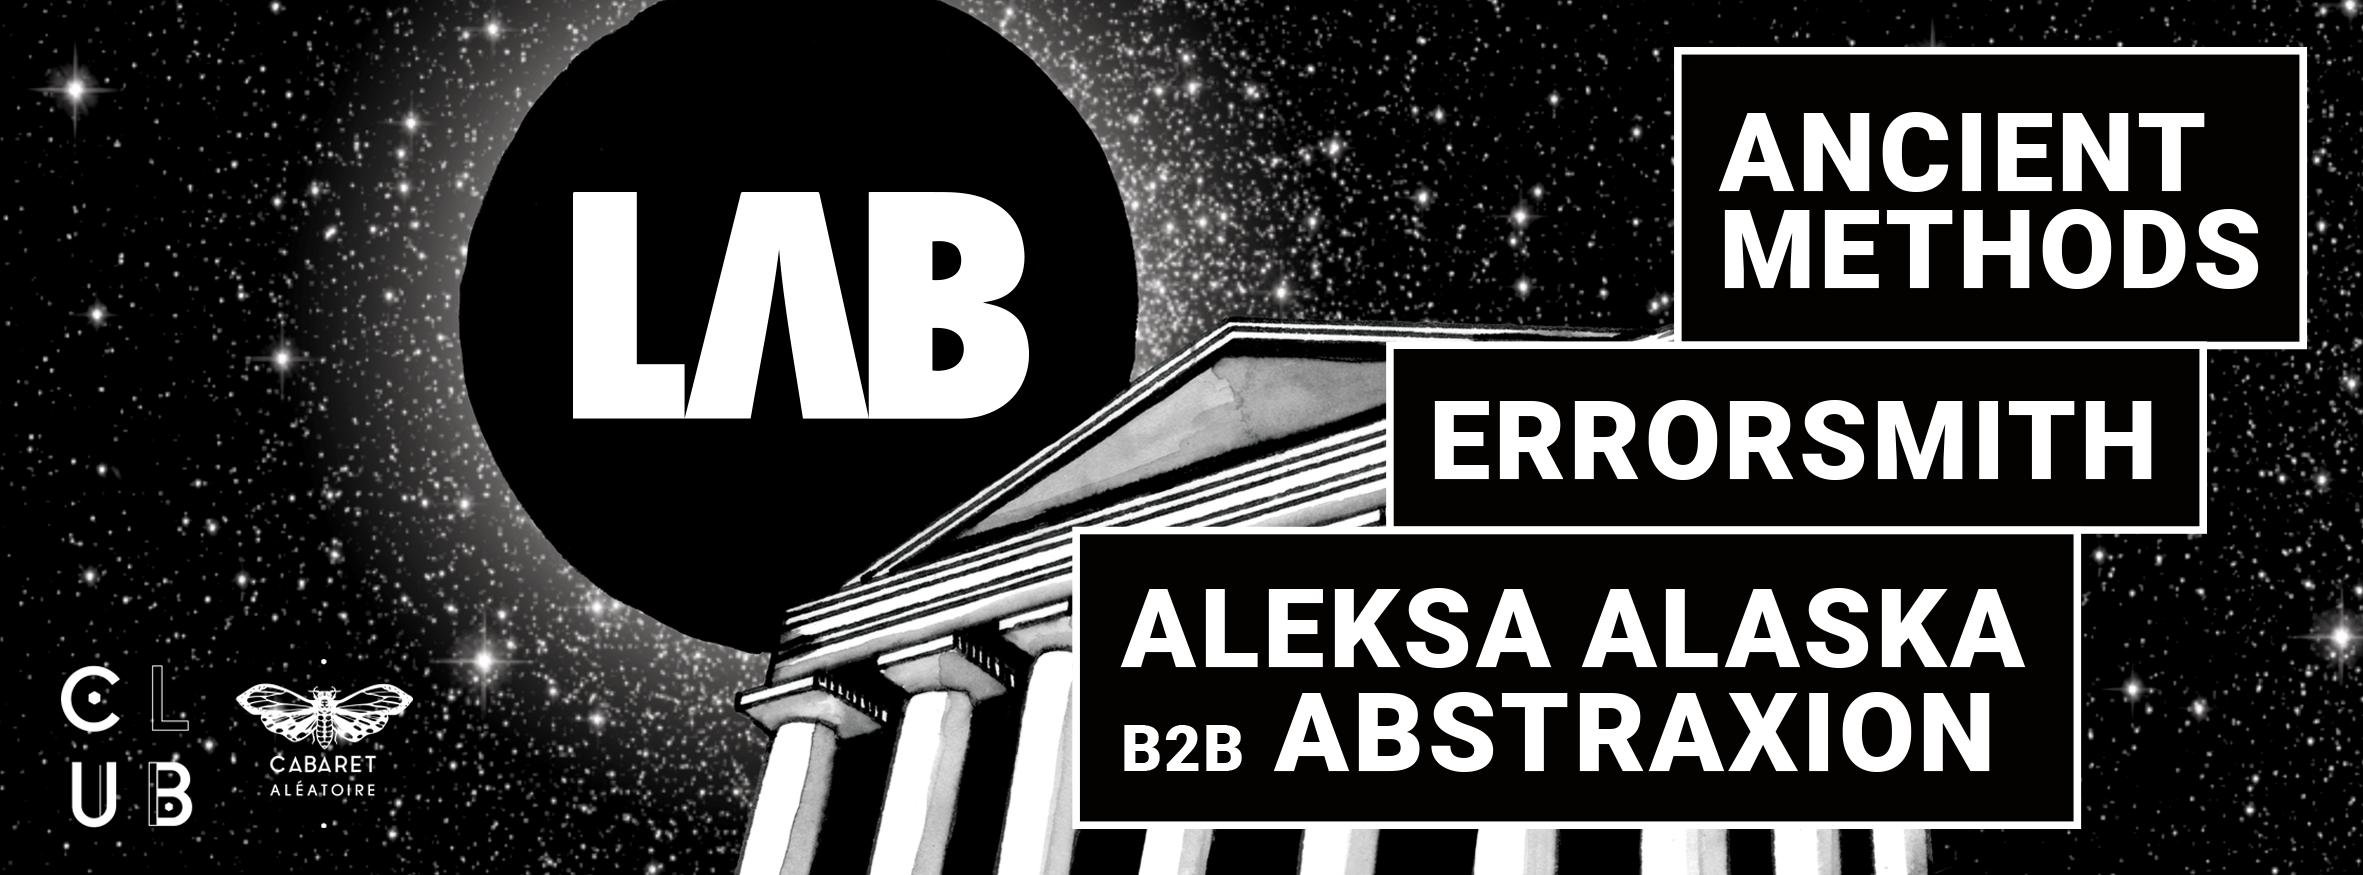 Club Cabaret x LAB : Ancient Methods + errorsmith (live)+ Aleksa Alaska b2b Abstraxion